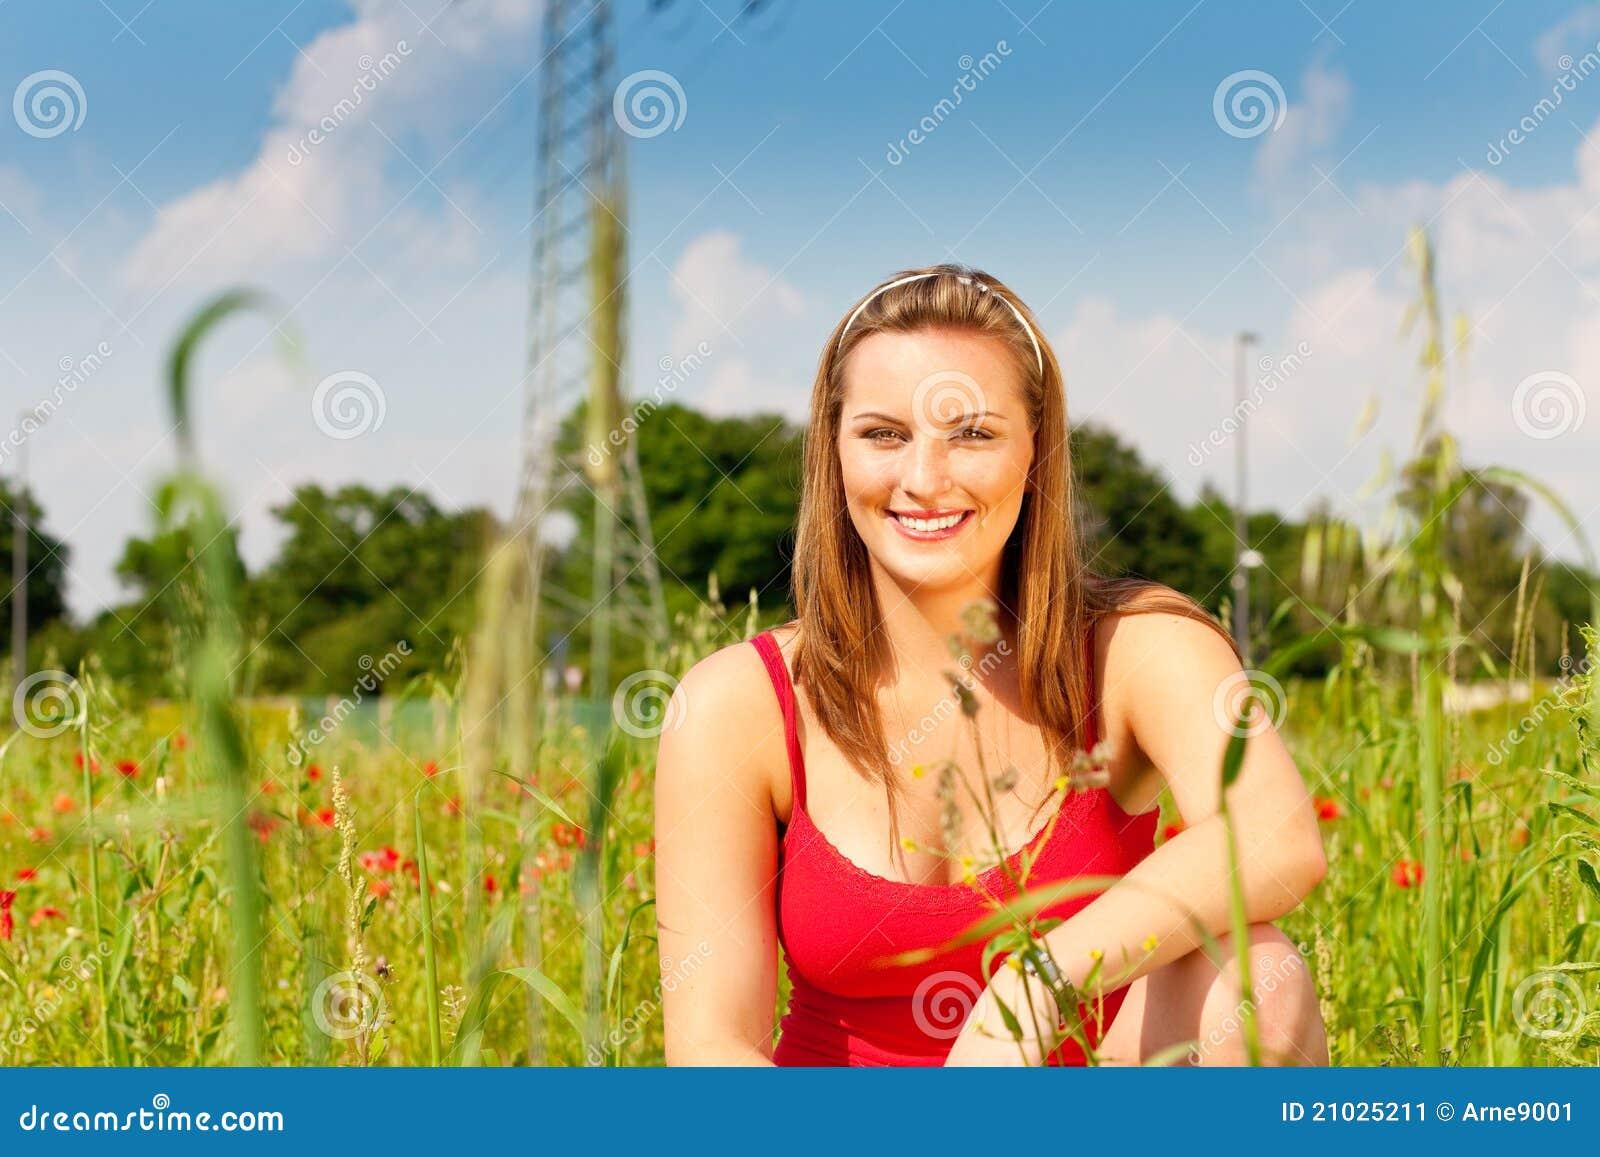 Woman cowering in meadow of field